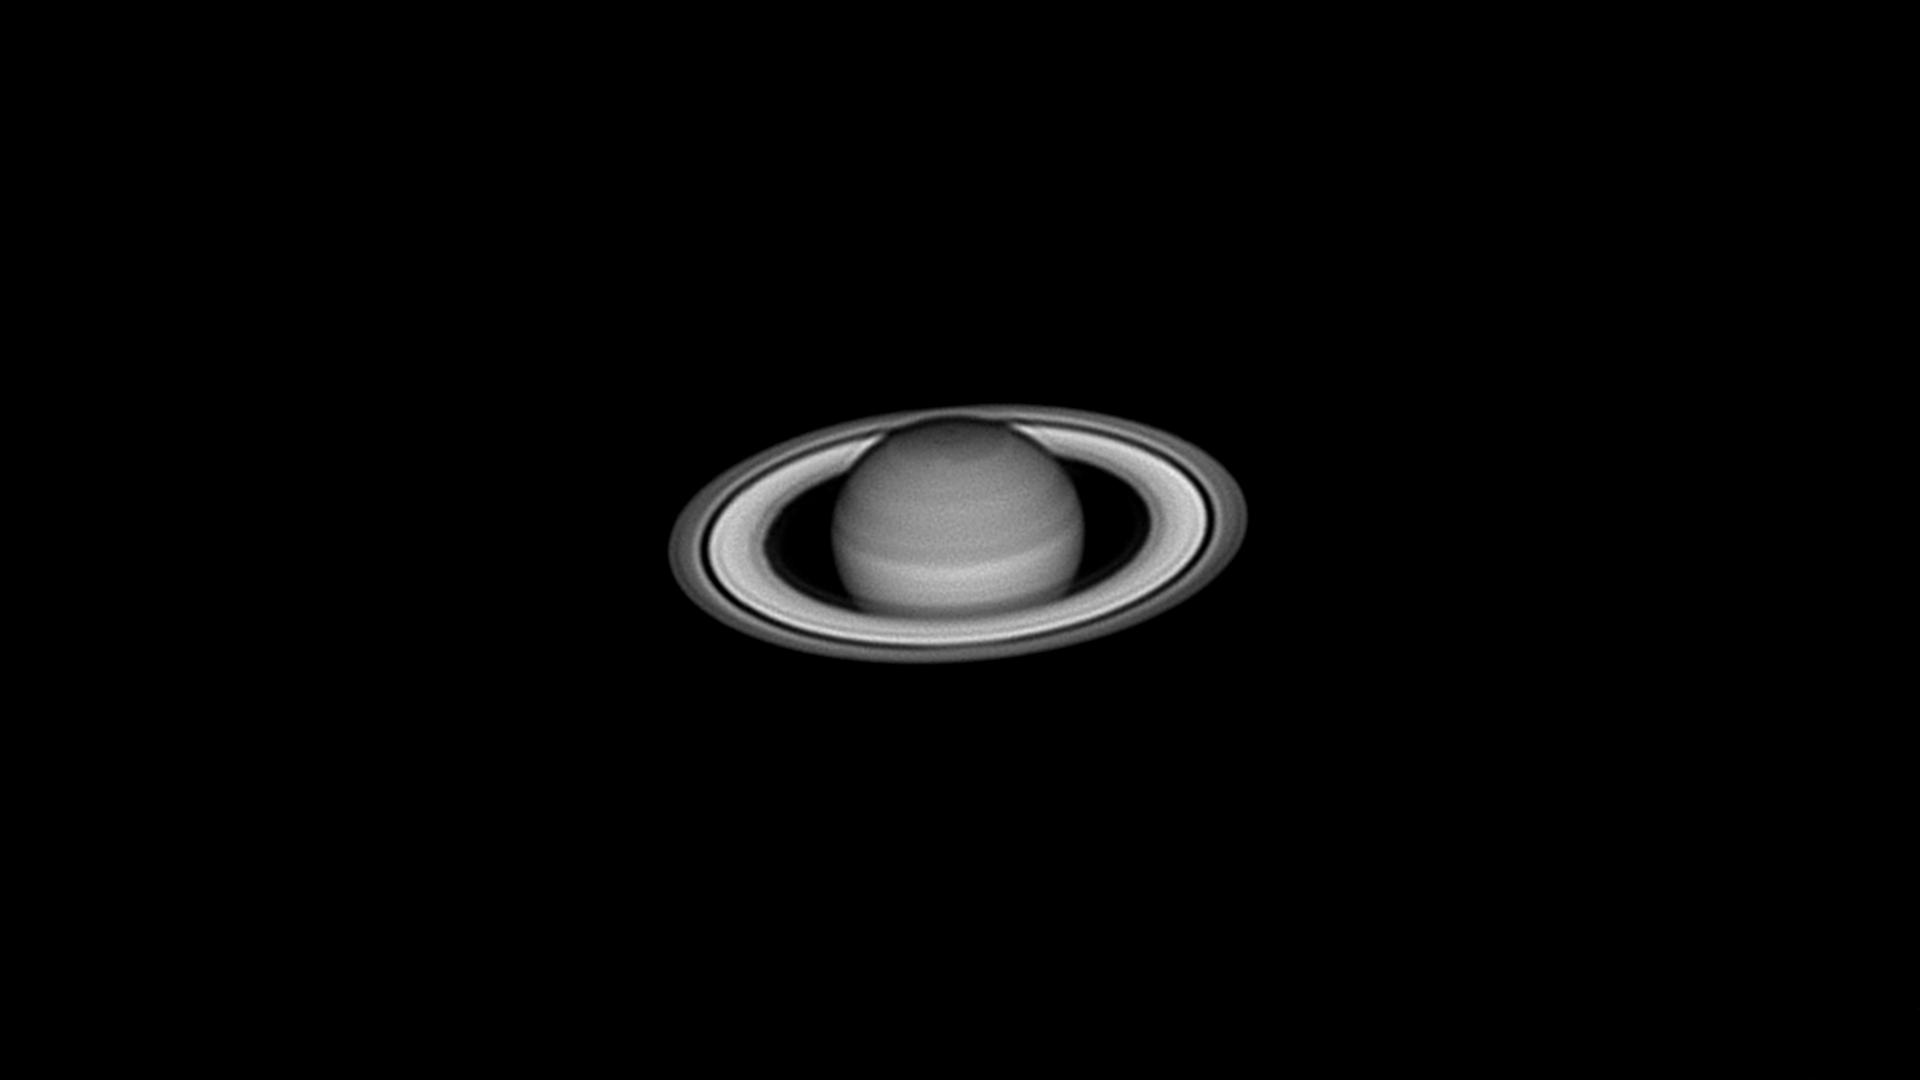 Saturne 23h38 TU le 7 juillet 2018